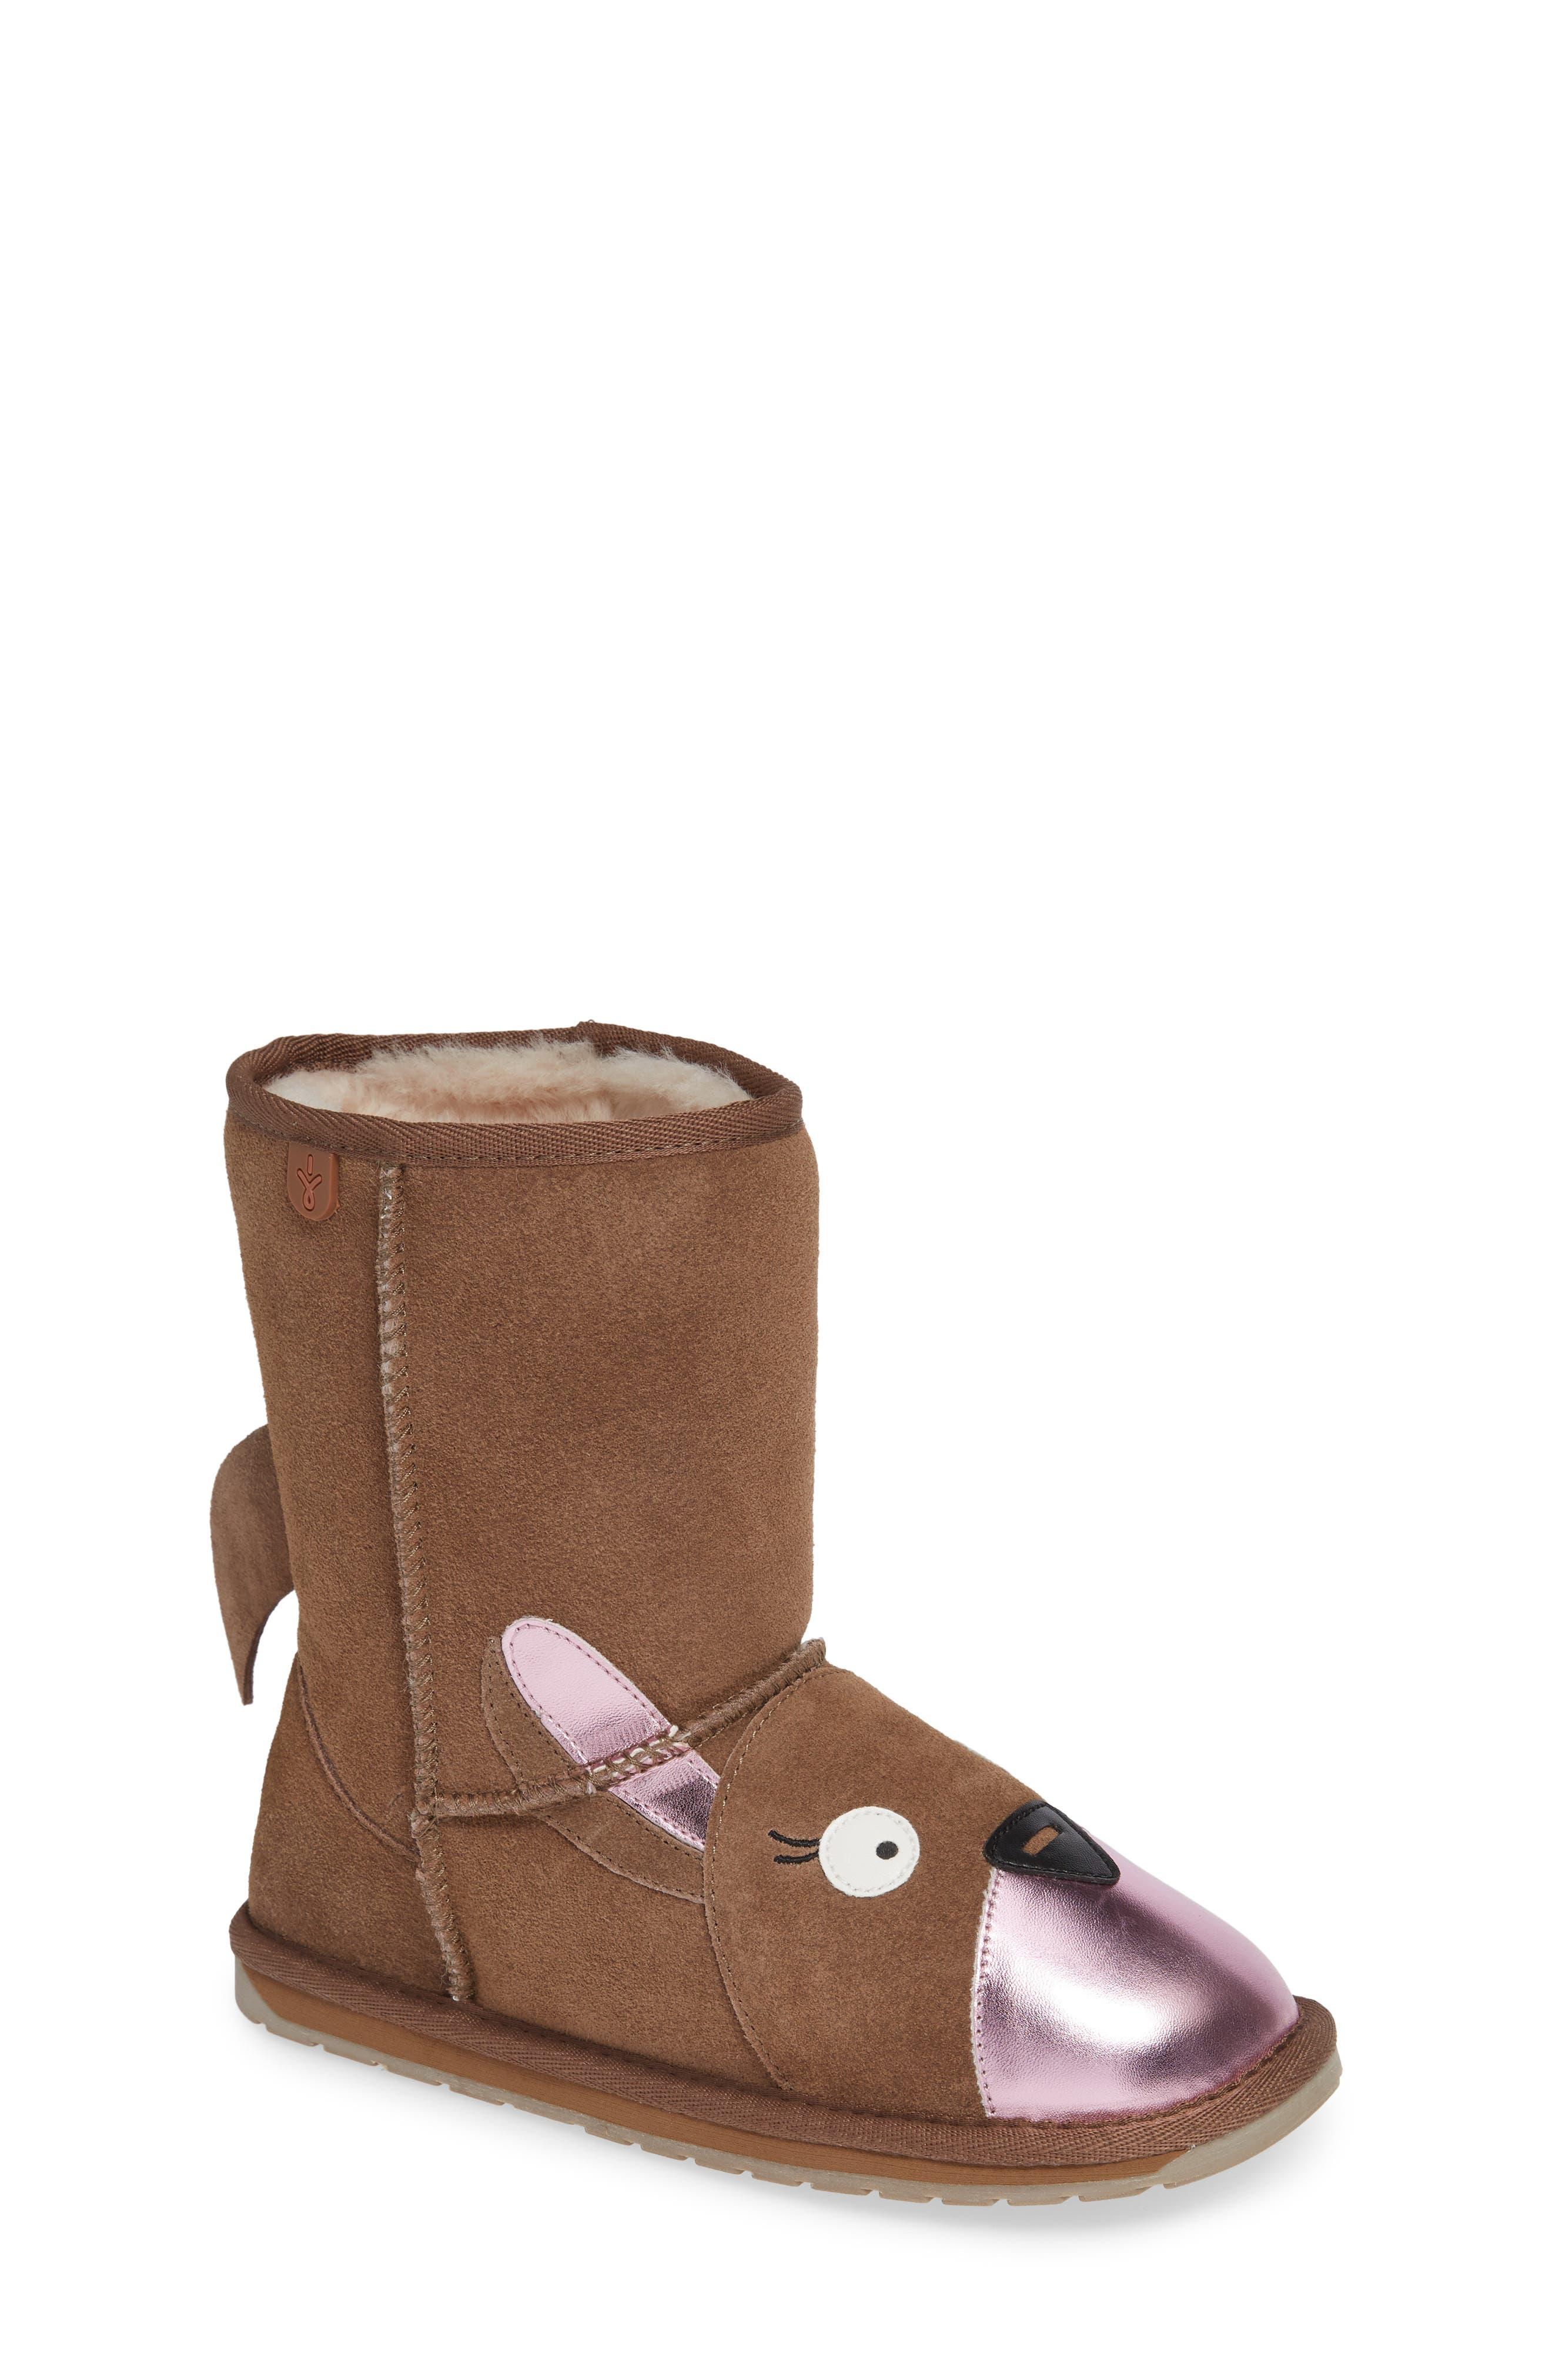 Kanga Wool Lined Boot,                         Main,                         color, OAK